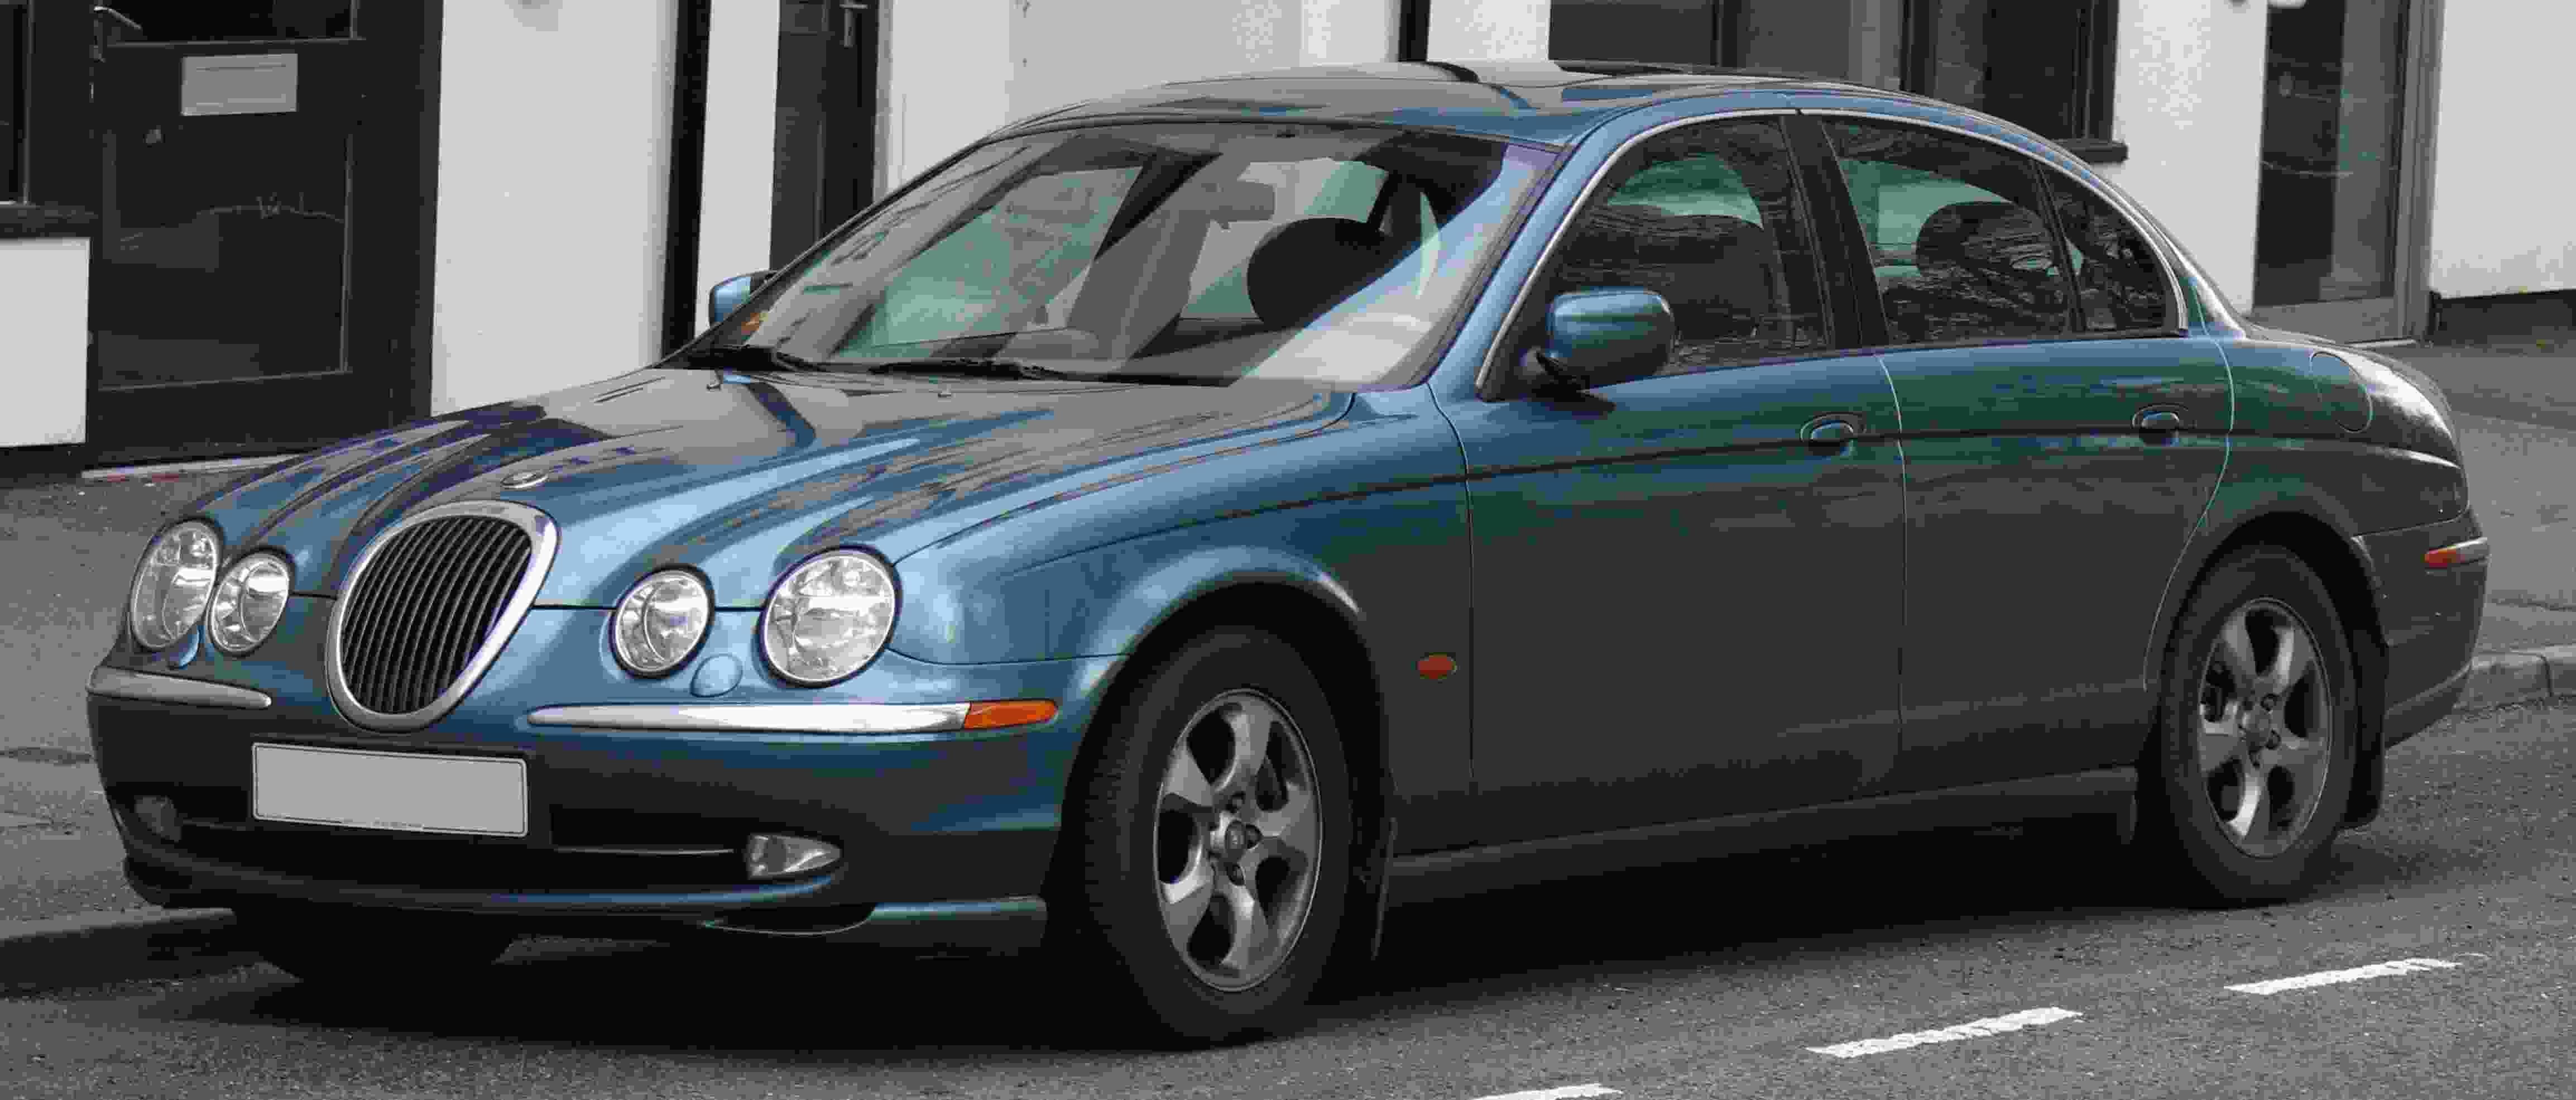 s type jaguar s type for sale